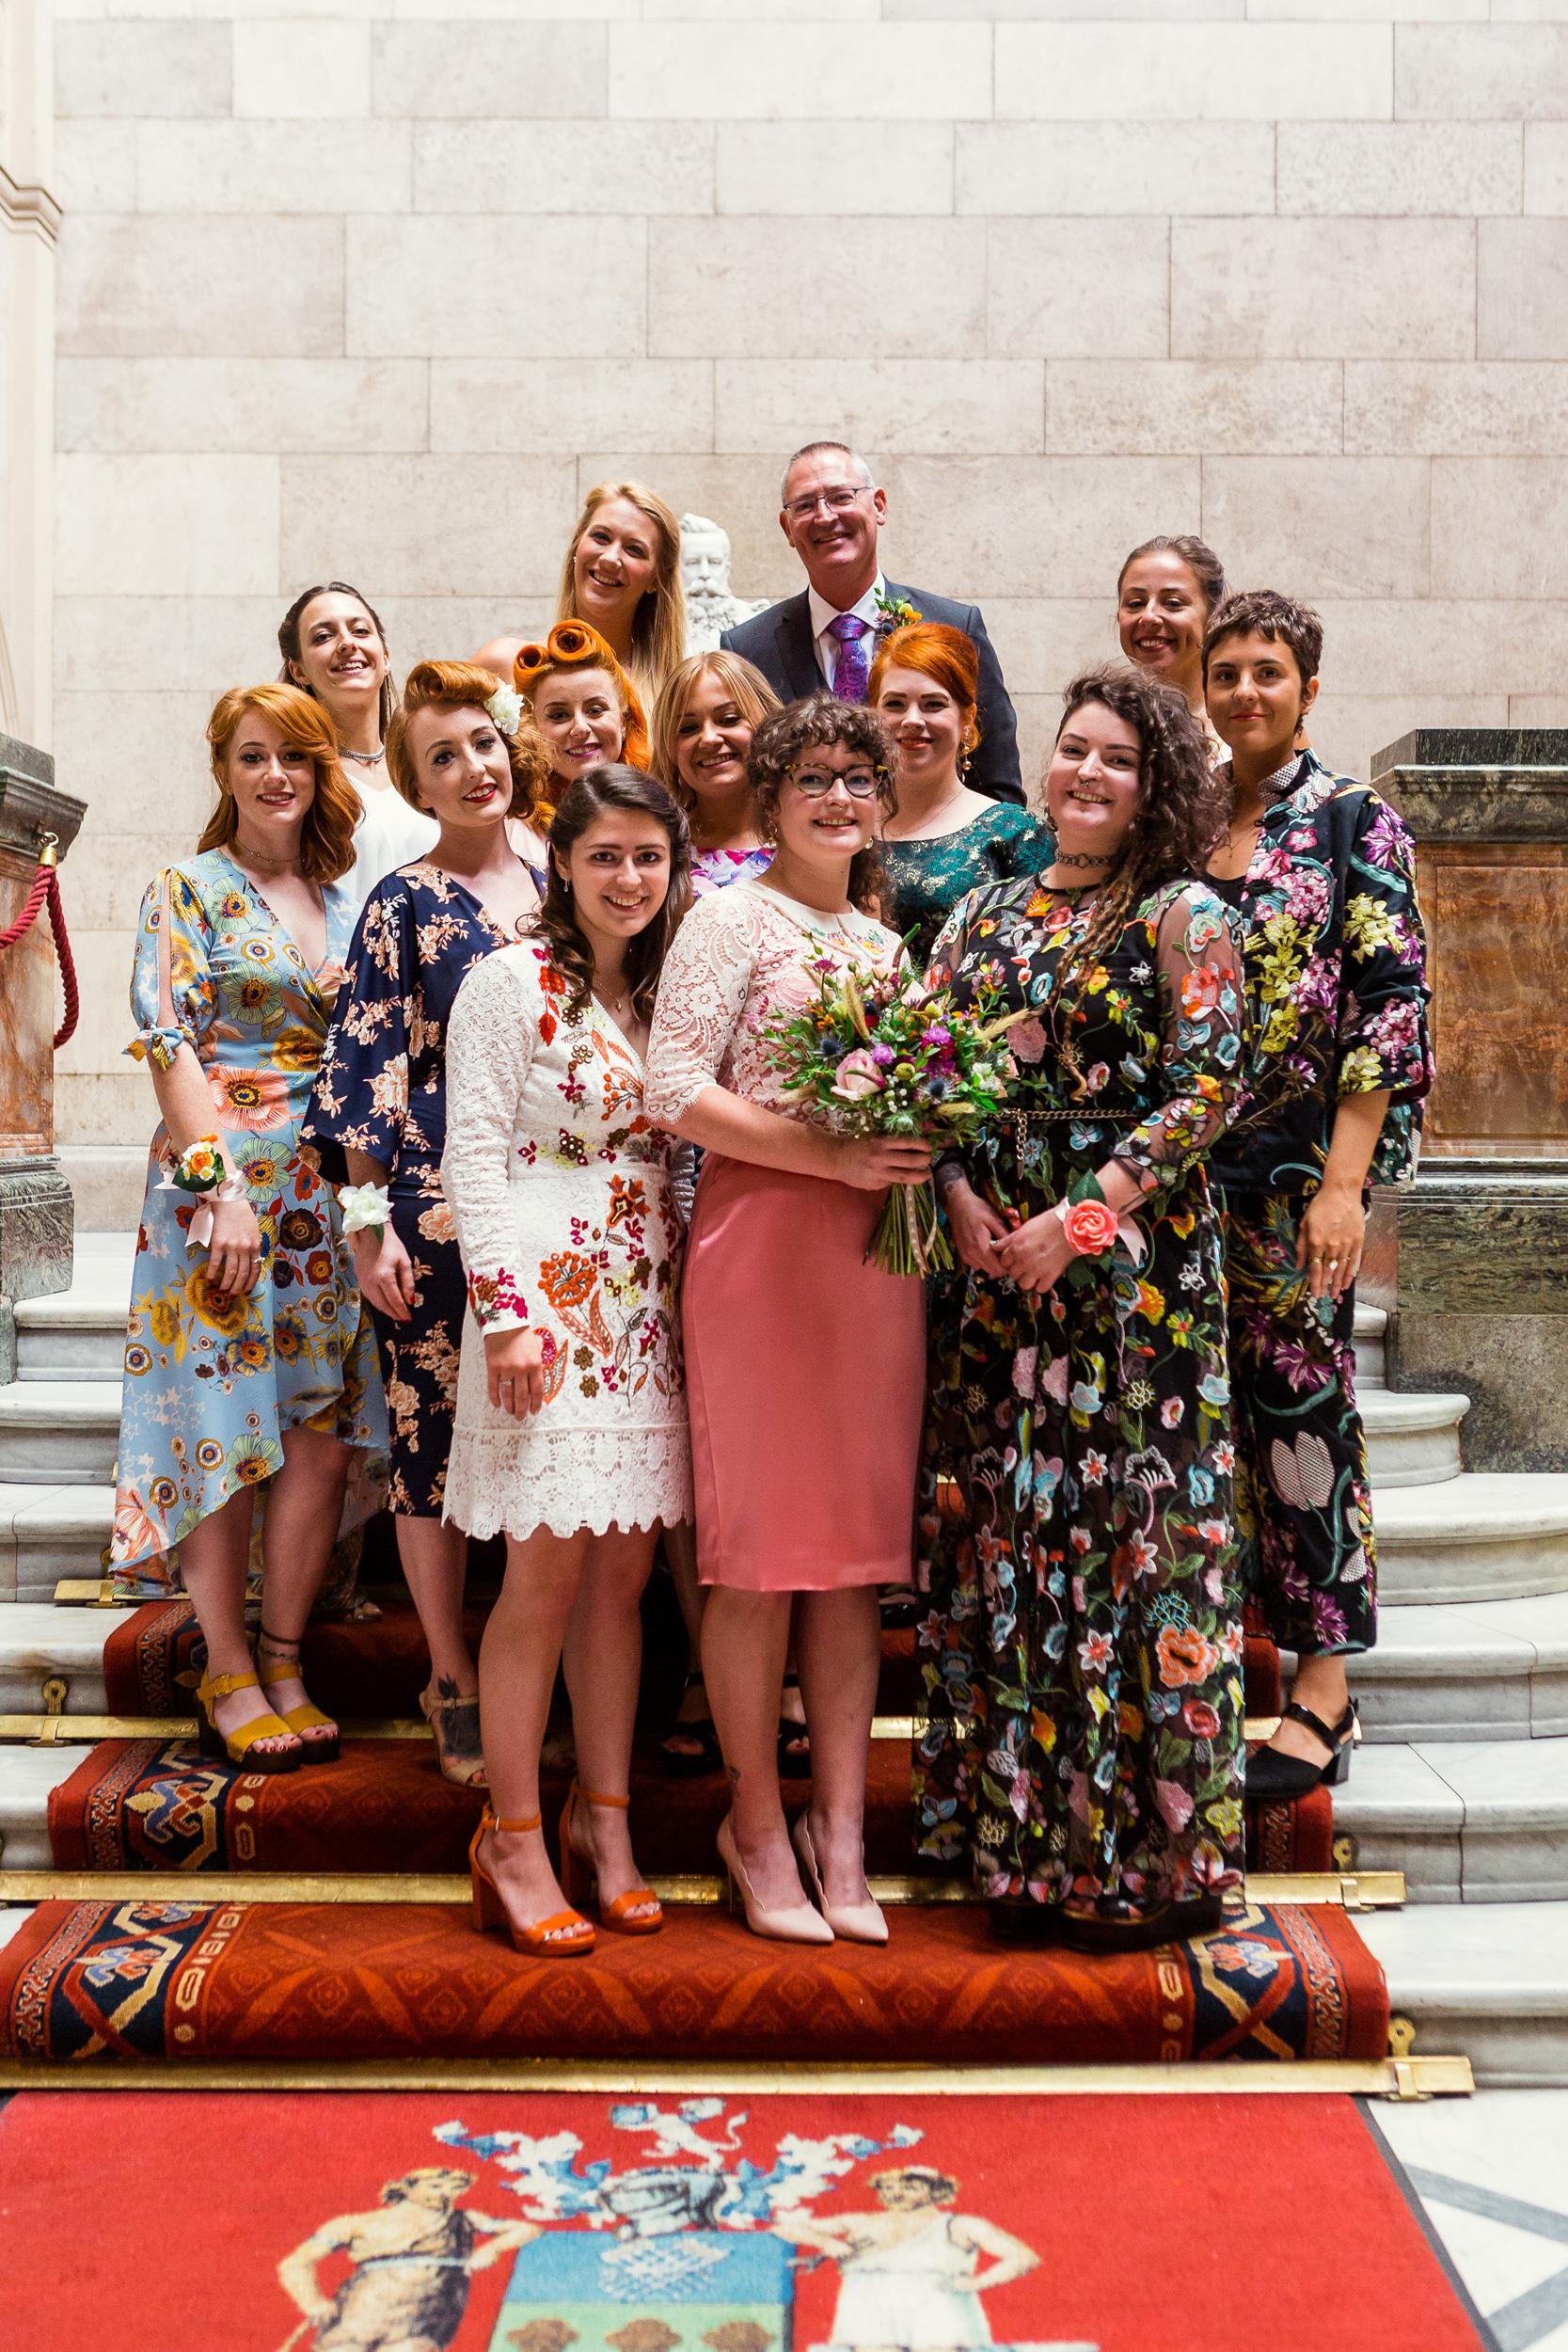 Emma-Coloured-Wedding-Dress-Sheffield-Kate-Beaumont-4.jpg